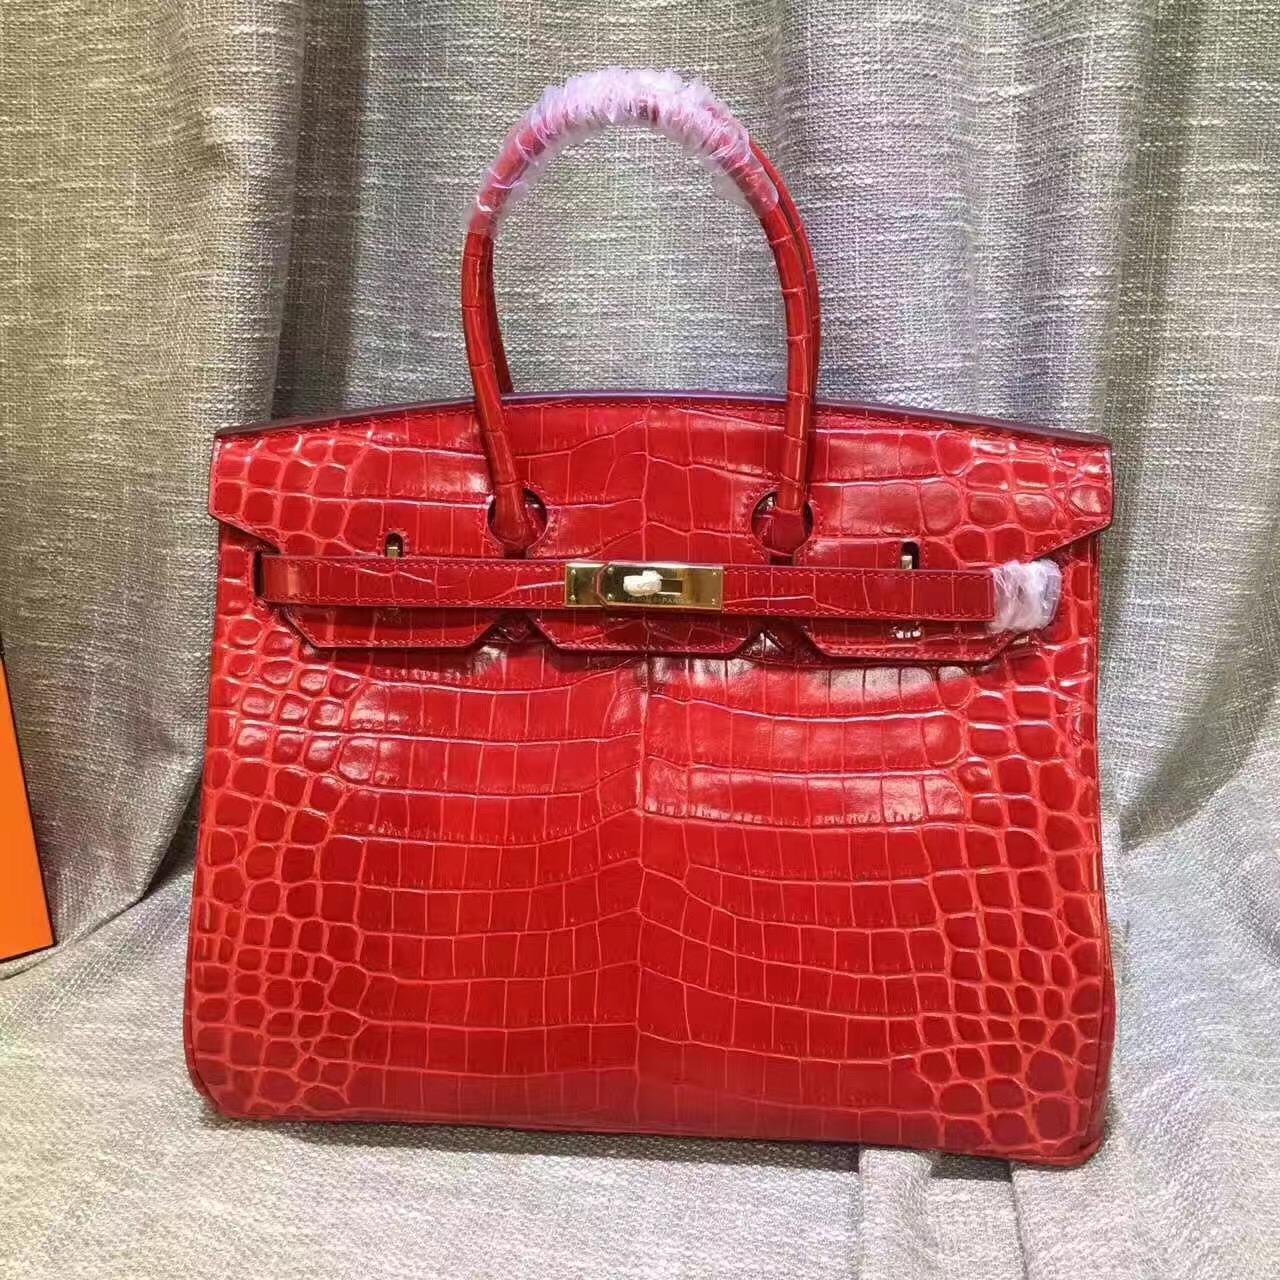 4a3ad31abdc8 Hermes Birkin 35cm Handbag Crocodile Leather Red Gold